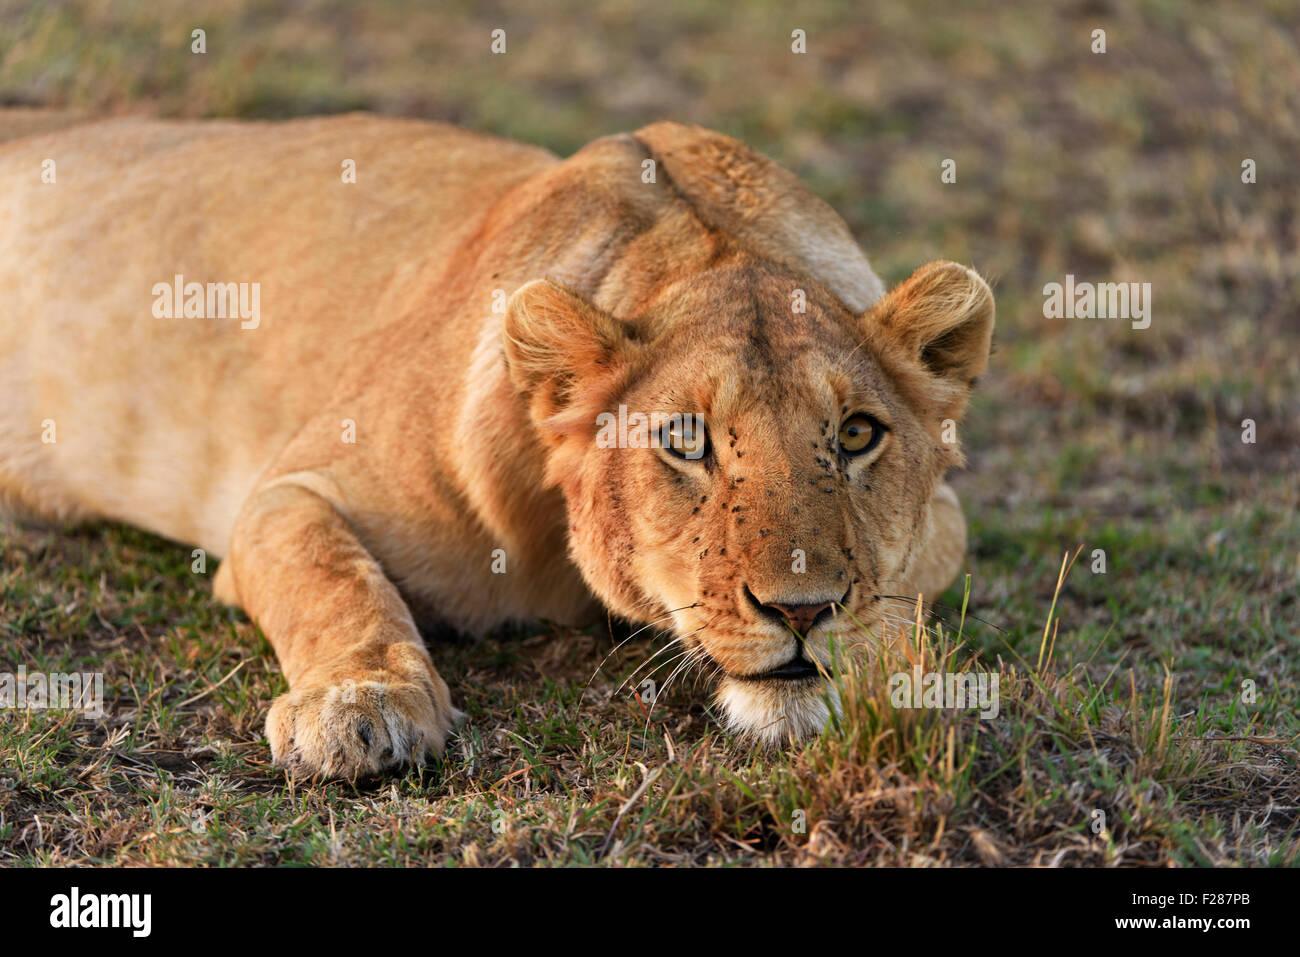 Lioness (Panthera leo) with a belligerent look, Maasai Mara National Reserve, Narok County, Kenya - Stock Image